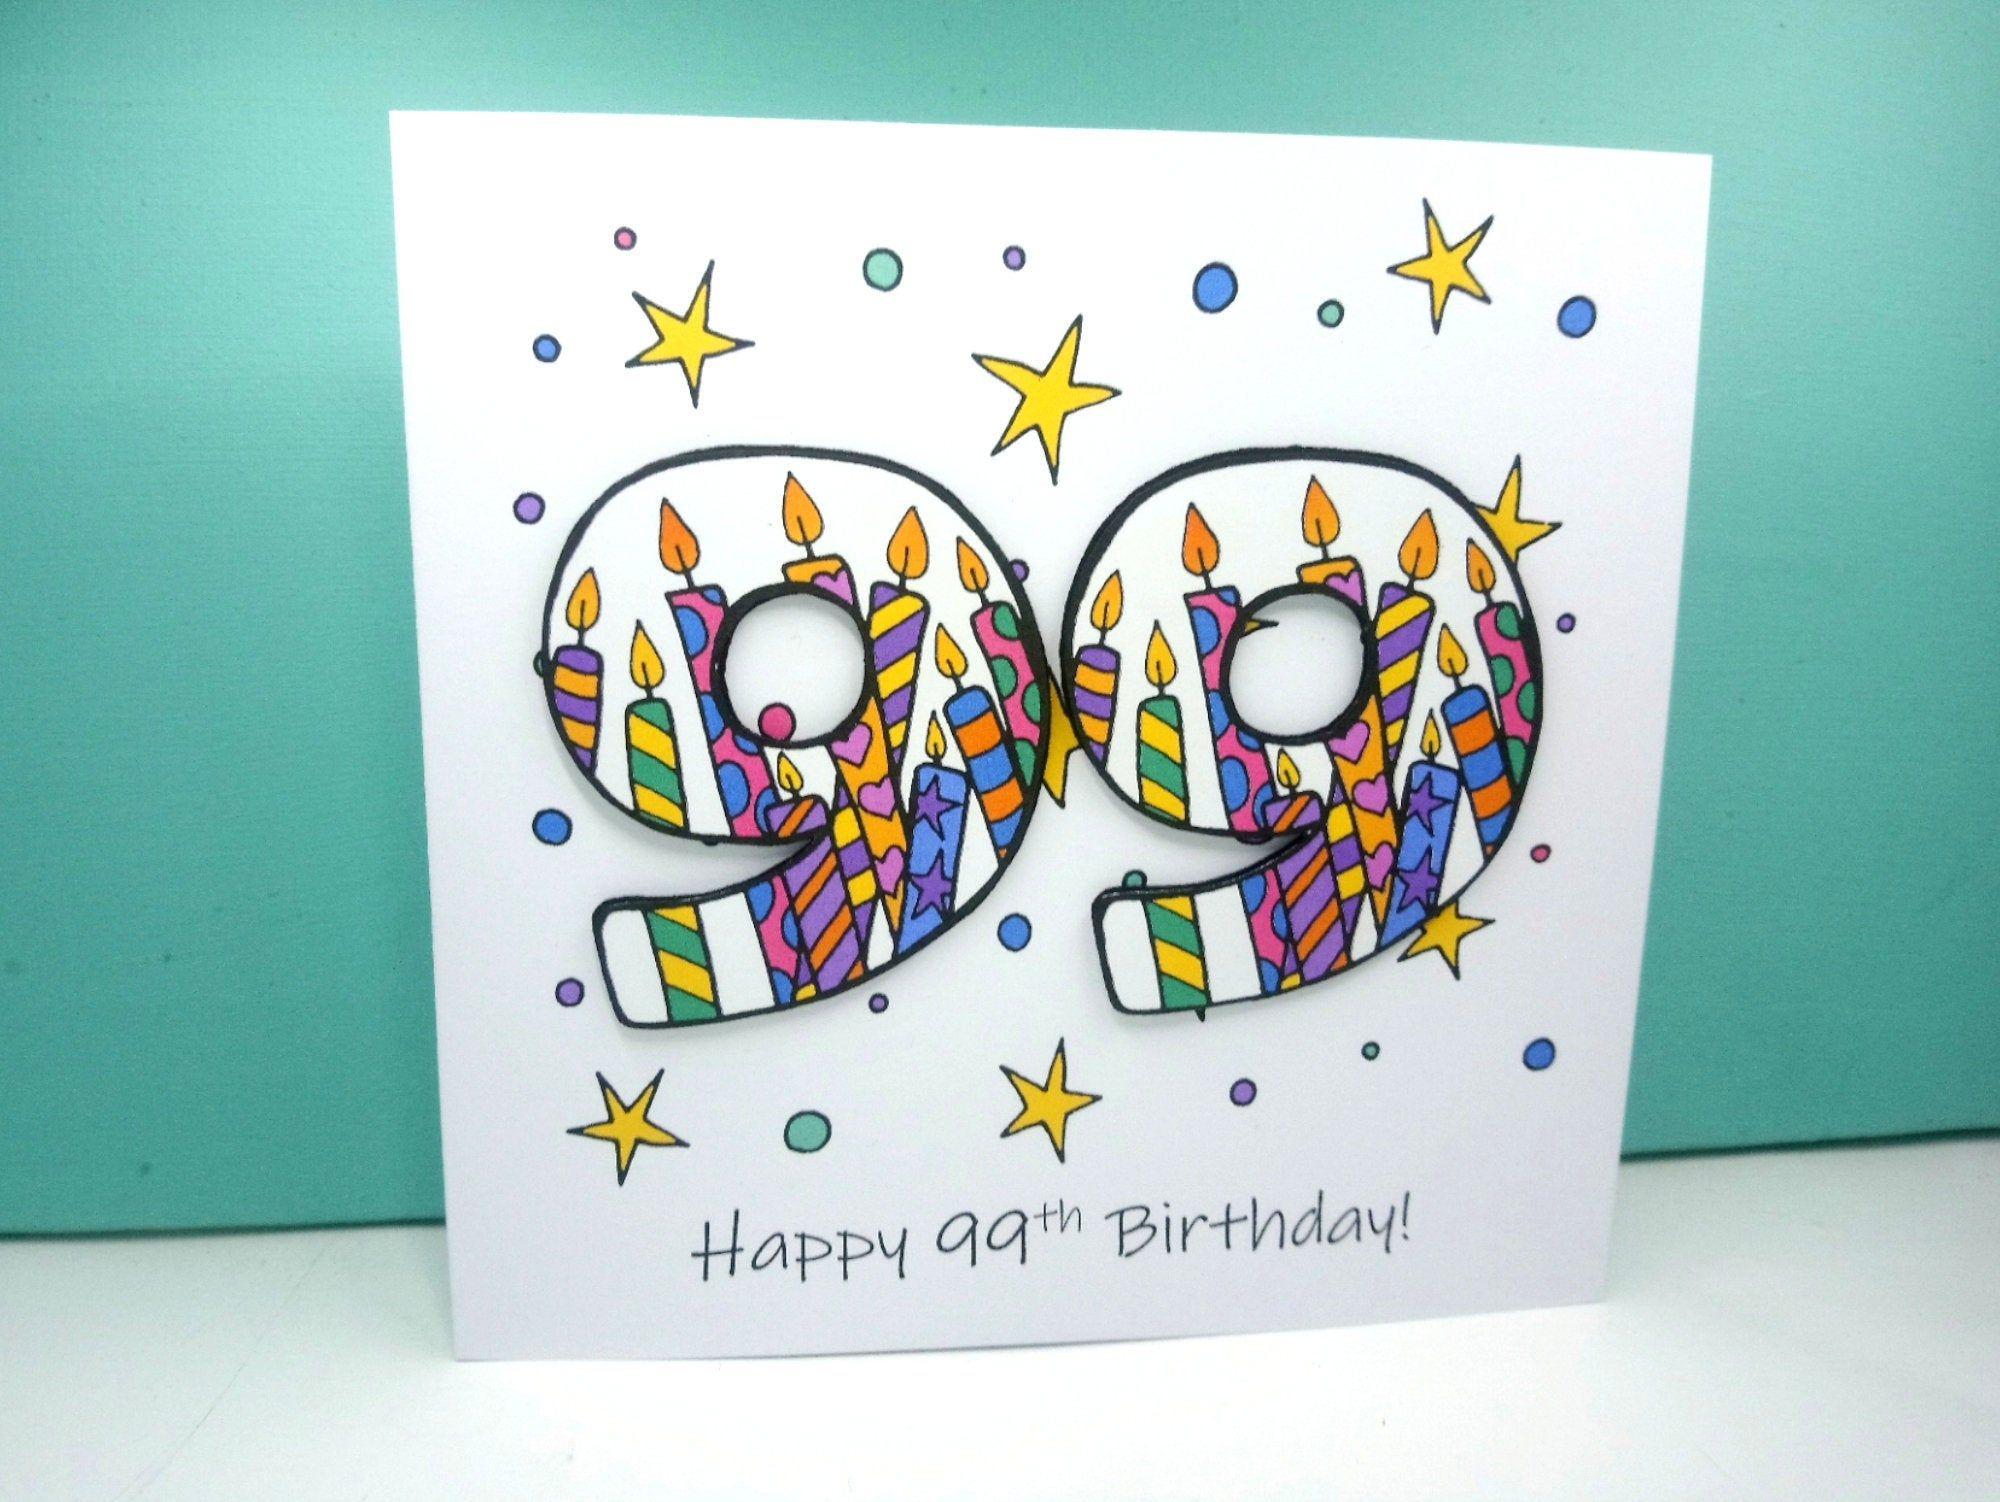 99th Birthday Card Happy 99th Birthday Ninety Nine Today Etsy Birthday Cards Happy 99 Birthday Cards